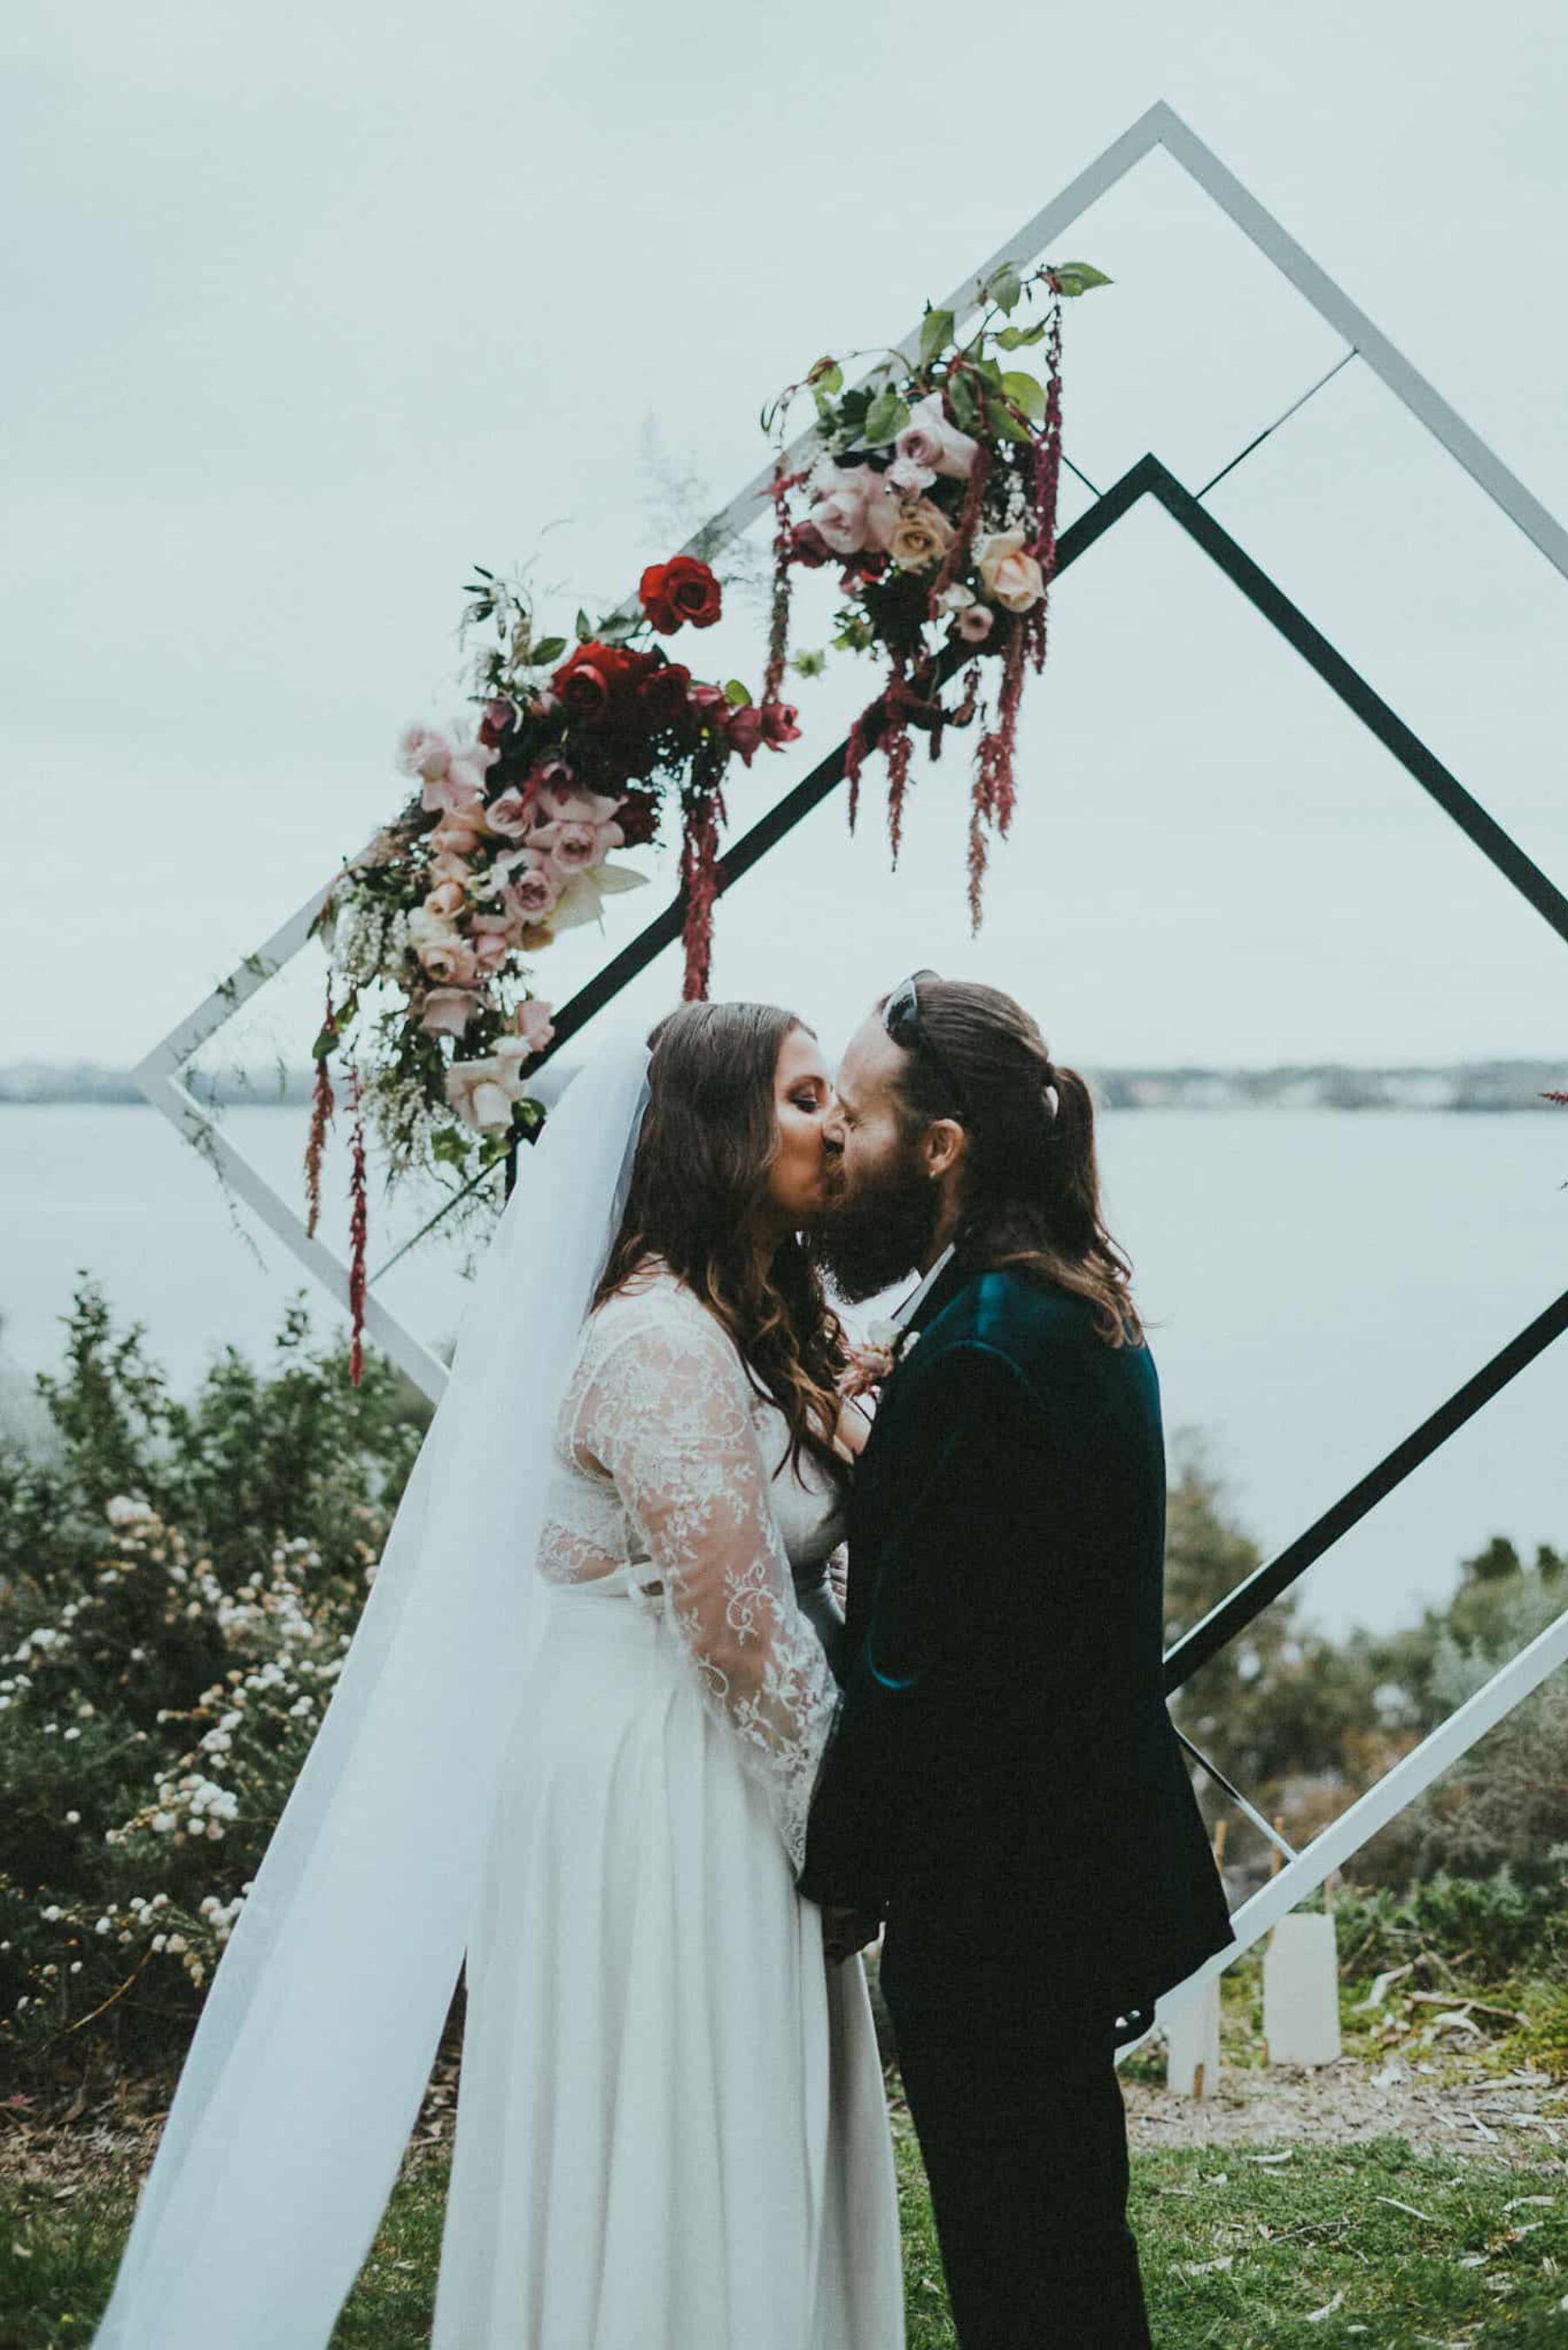 modern diamond wedding arbour with blush and burgundy flowers